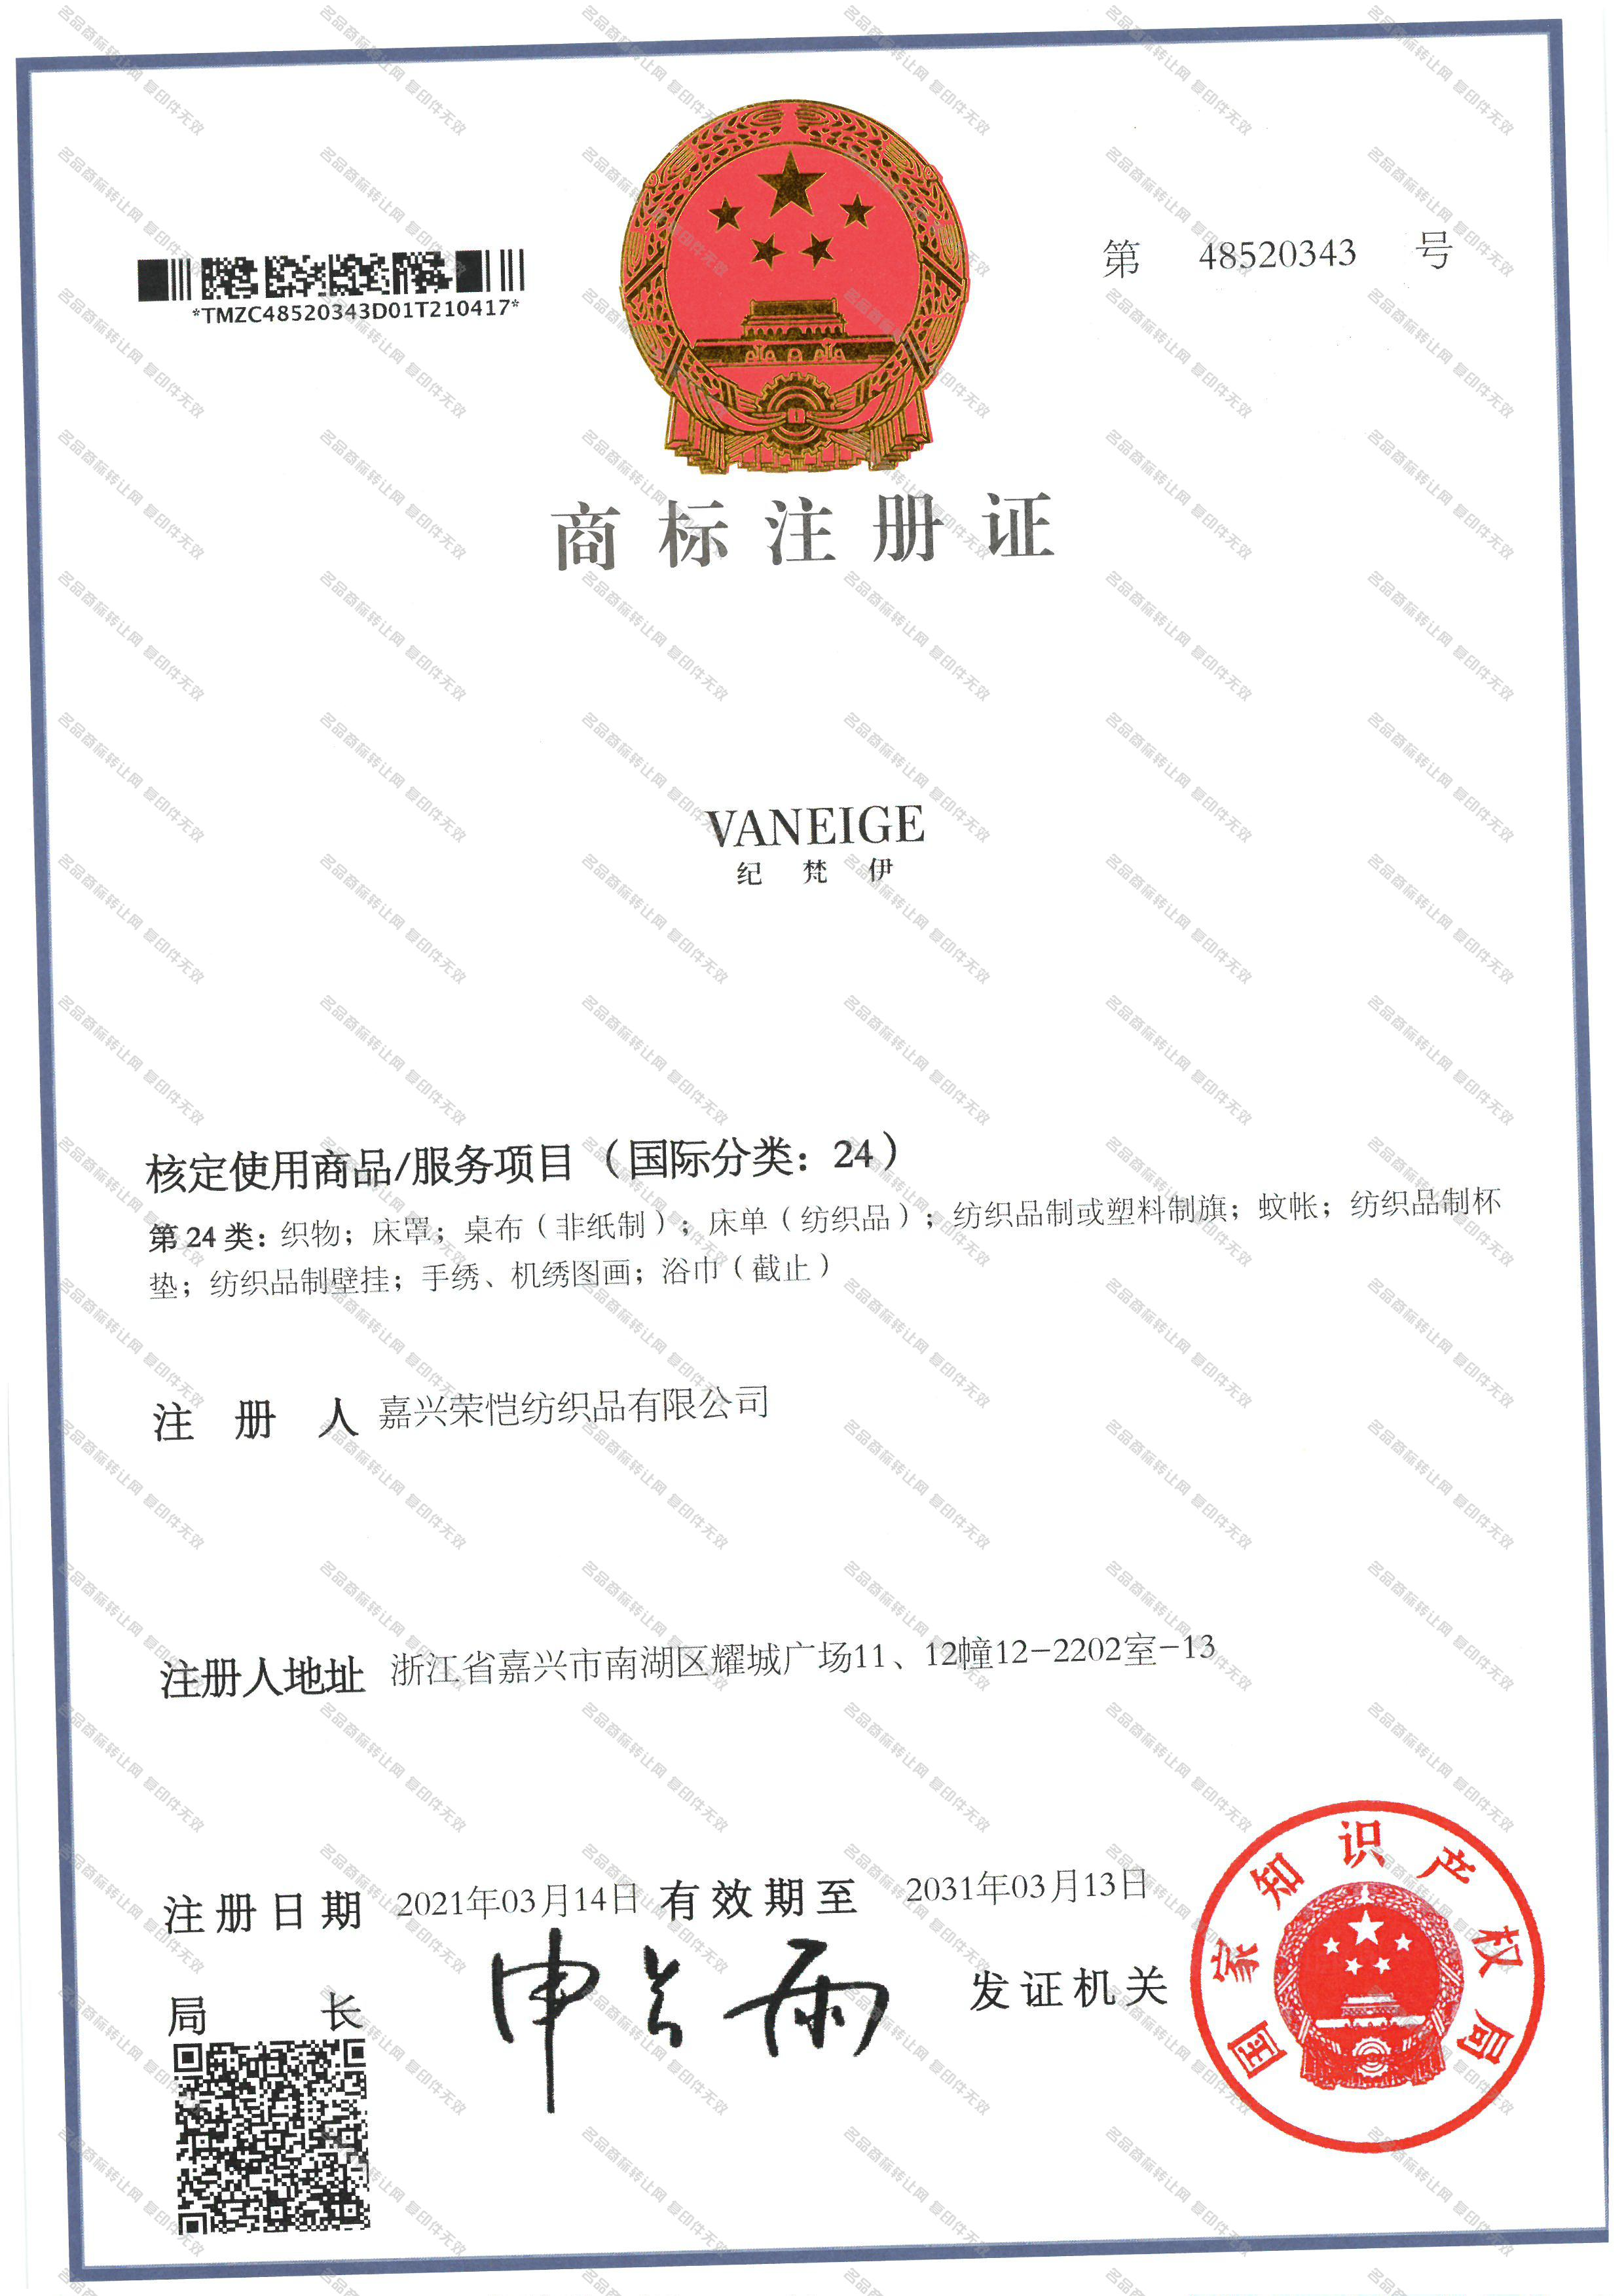 纪梵伊 VANEIGE注册证